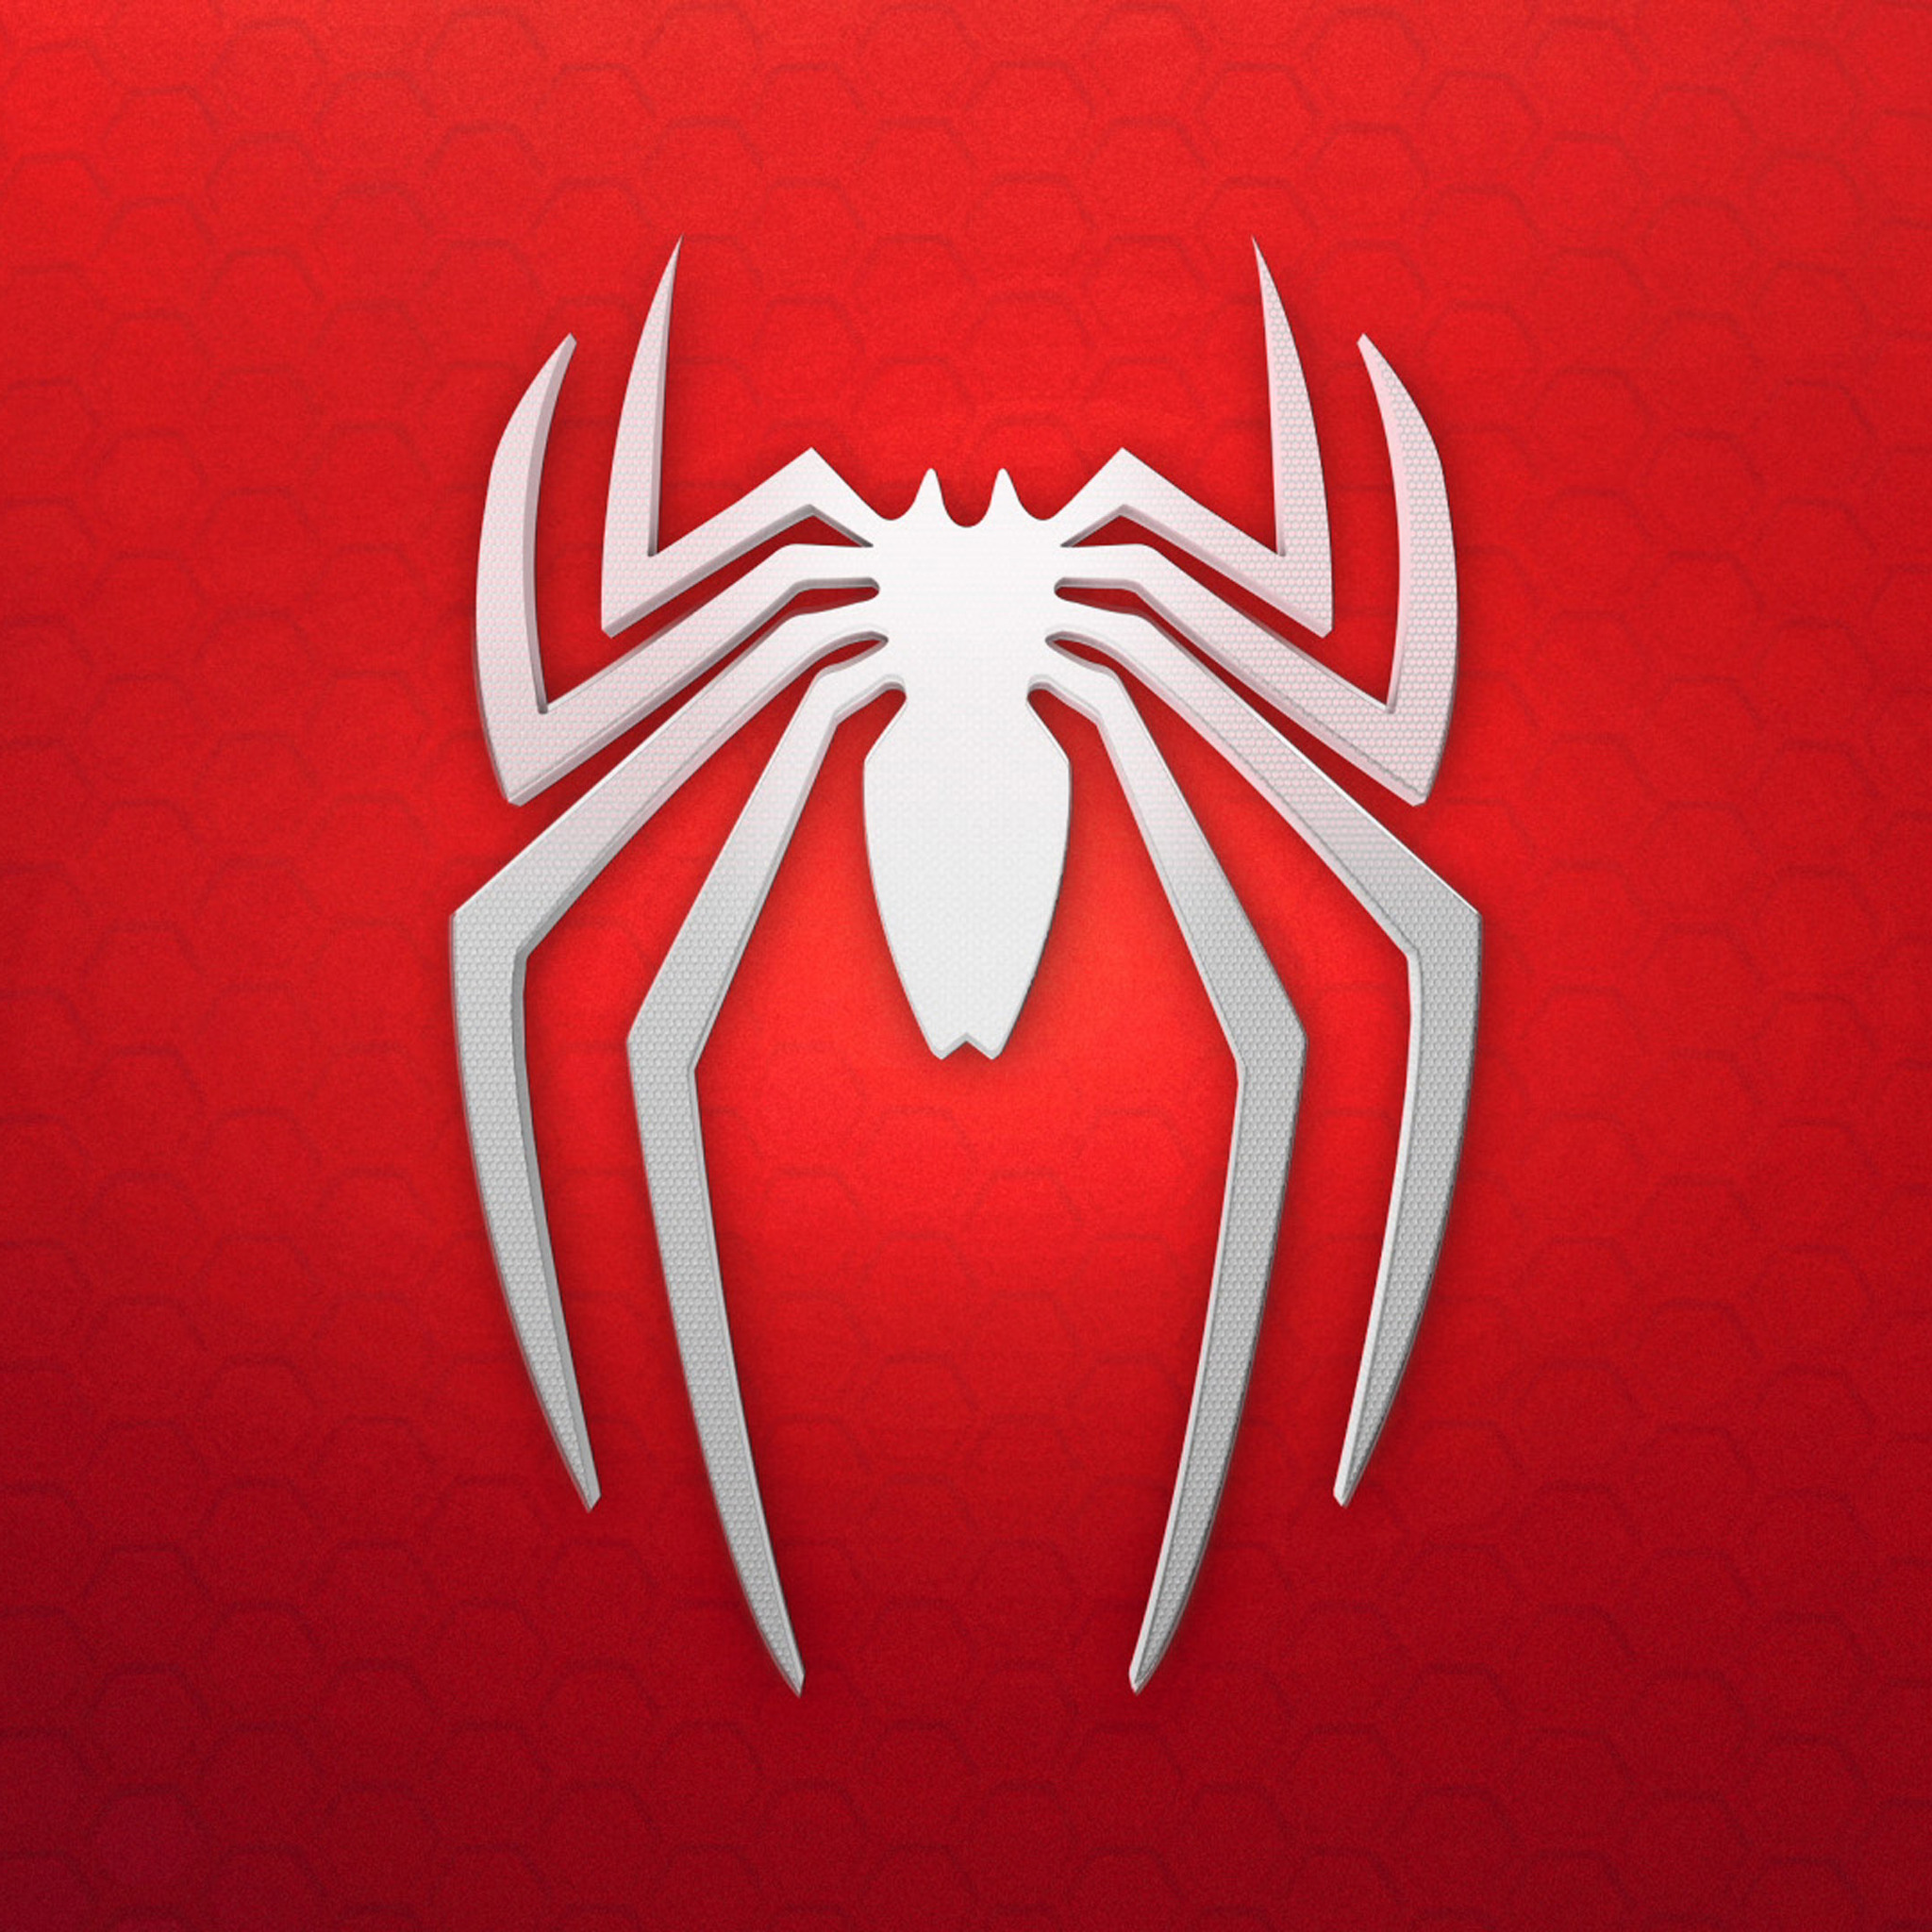 2048x2048 spiderman 4k logo background ipad air hd 4k